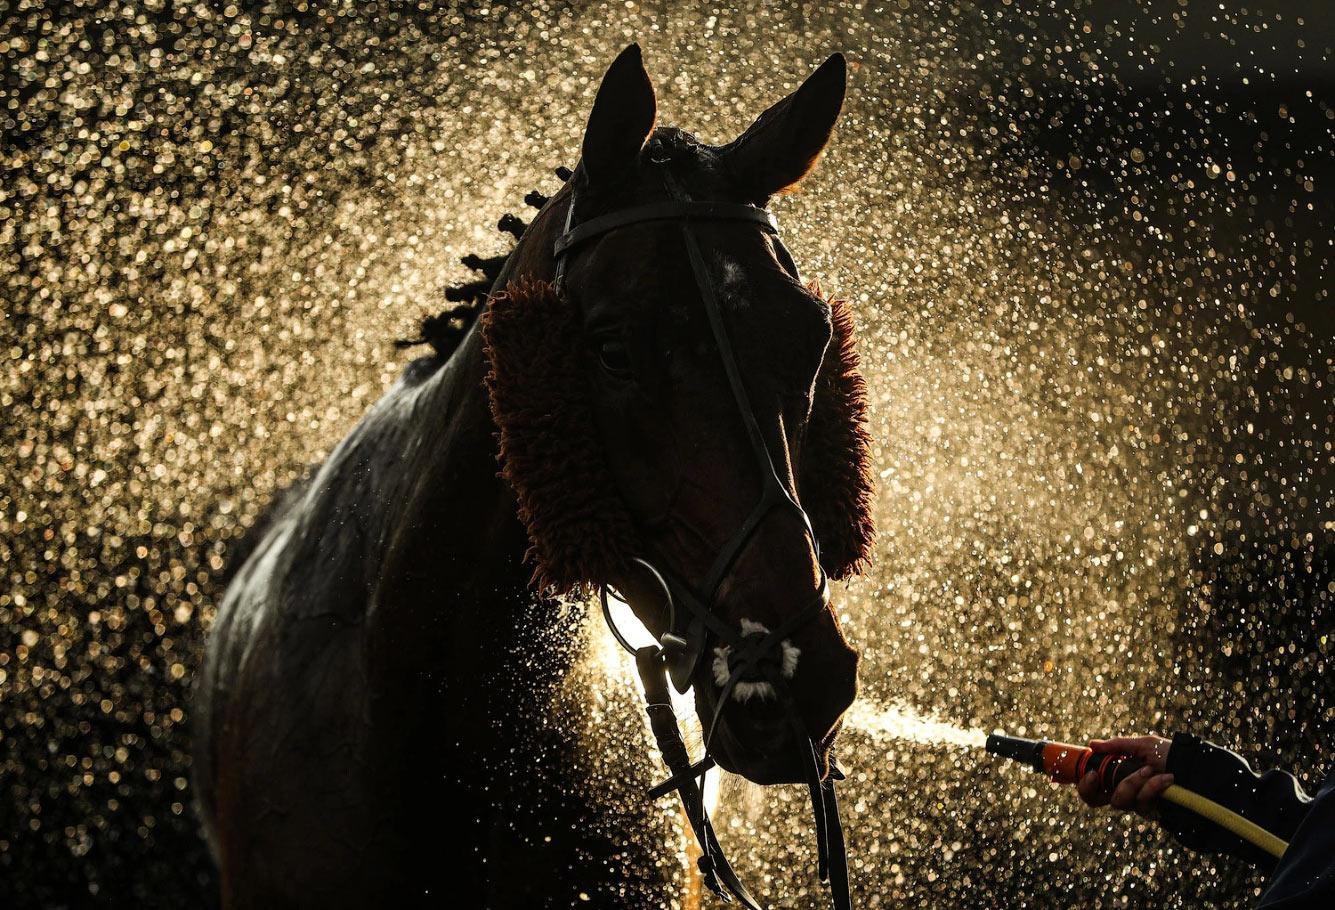 Лошадь на ипподроме в Уорике, Англия